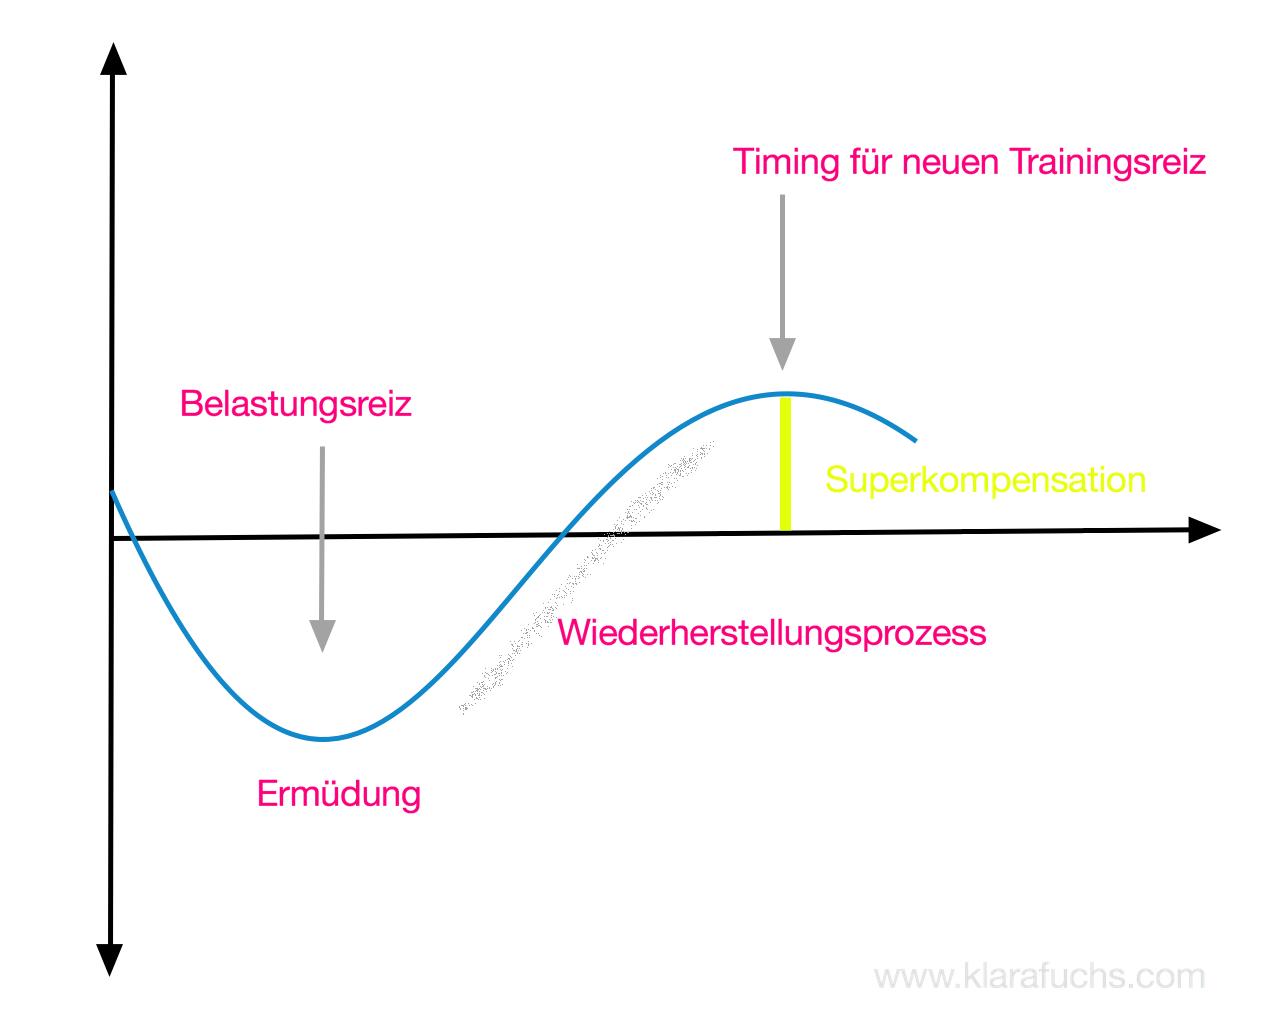 Superkompensation-überkompensation-trainingswissenschaft-klara-fuchs-fitness-blog-fitnessblog-blogger-österreich